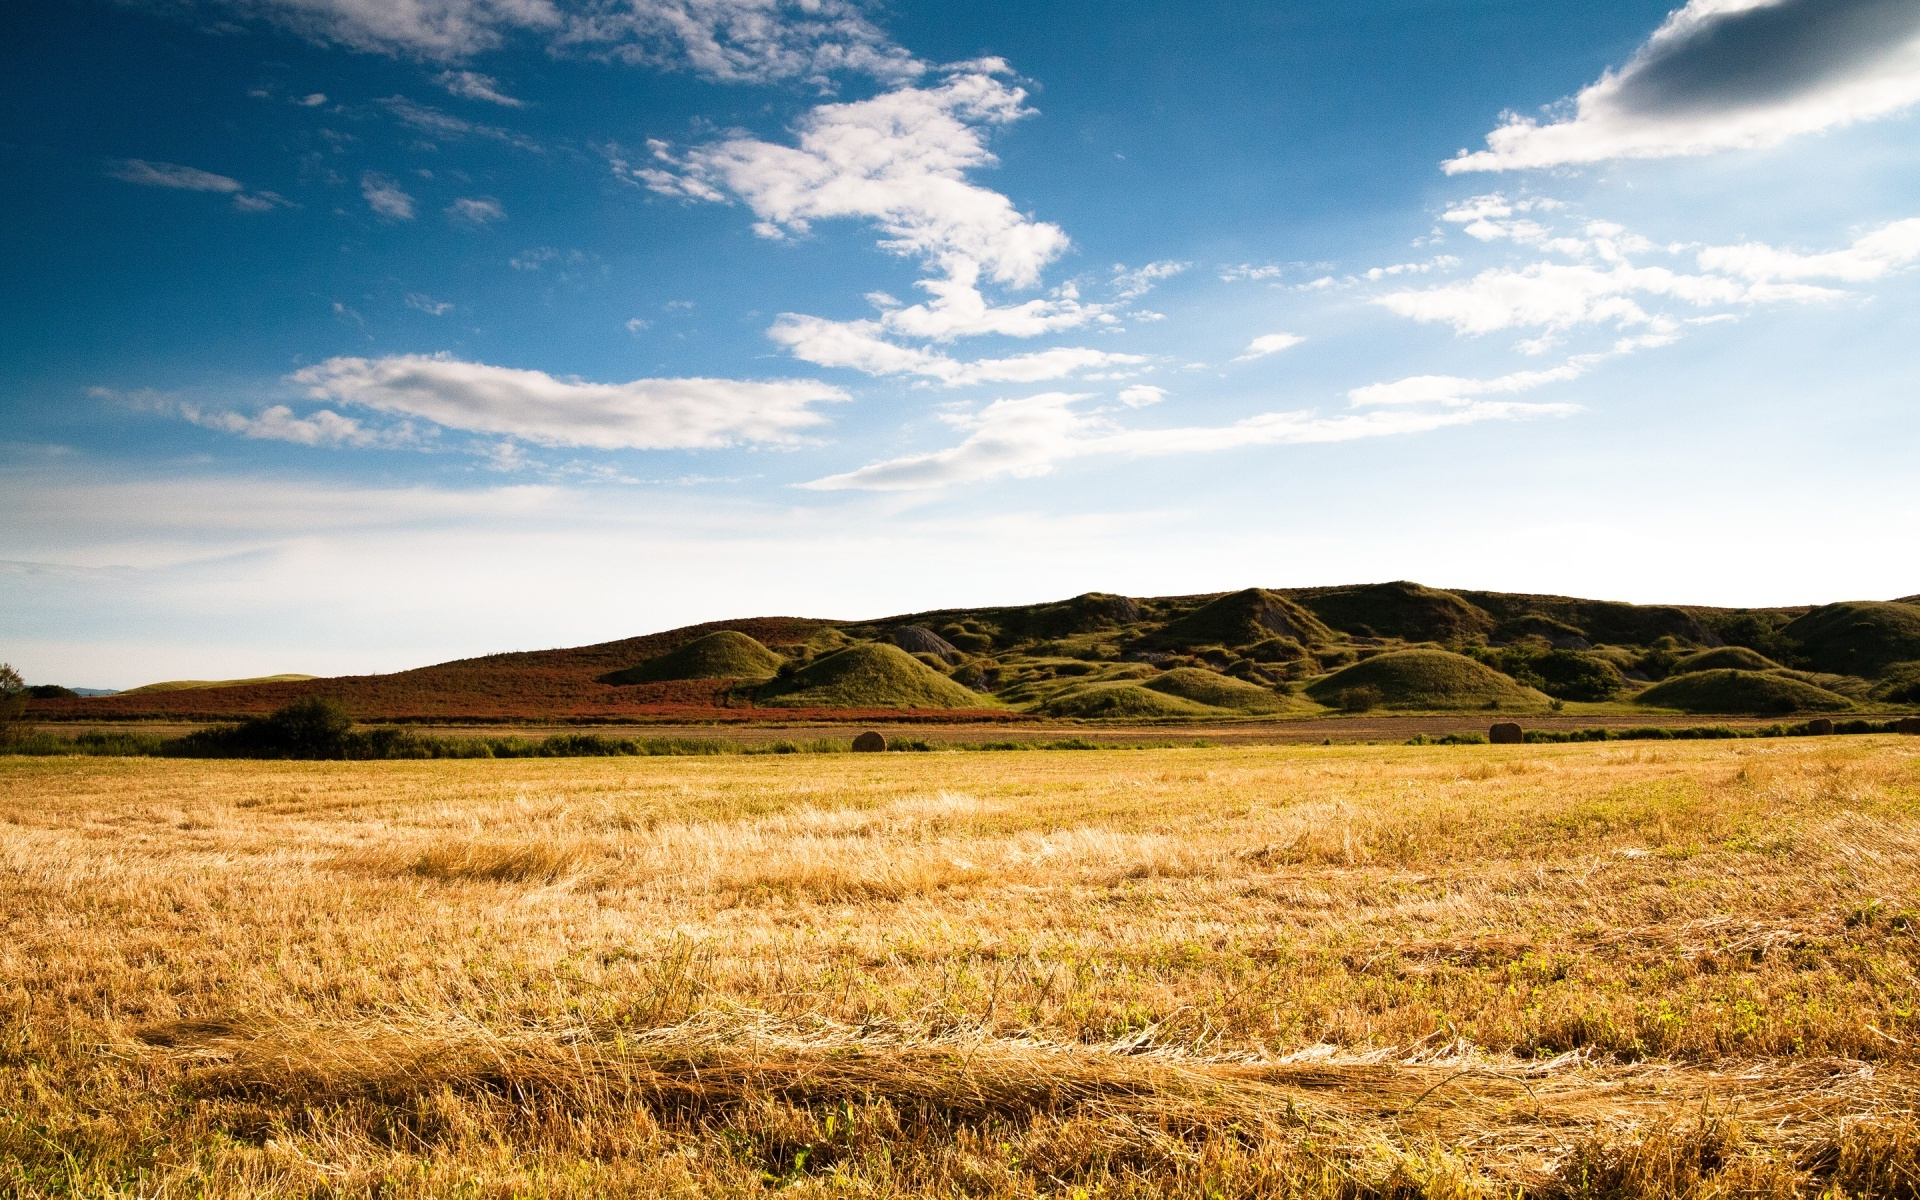 dry grass field background. Dry Grass HD Wallpaper #2072493 Field Background